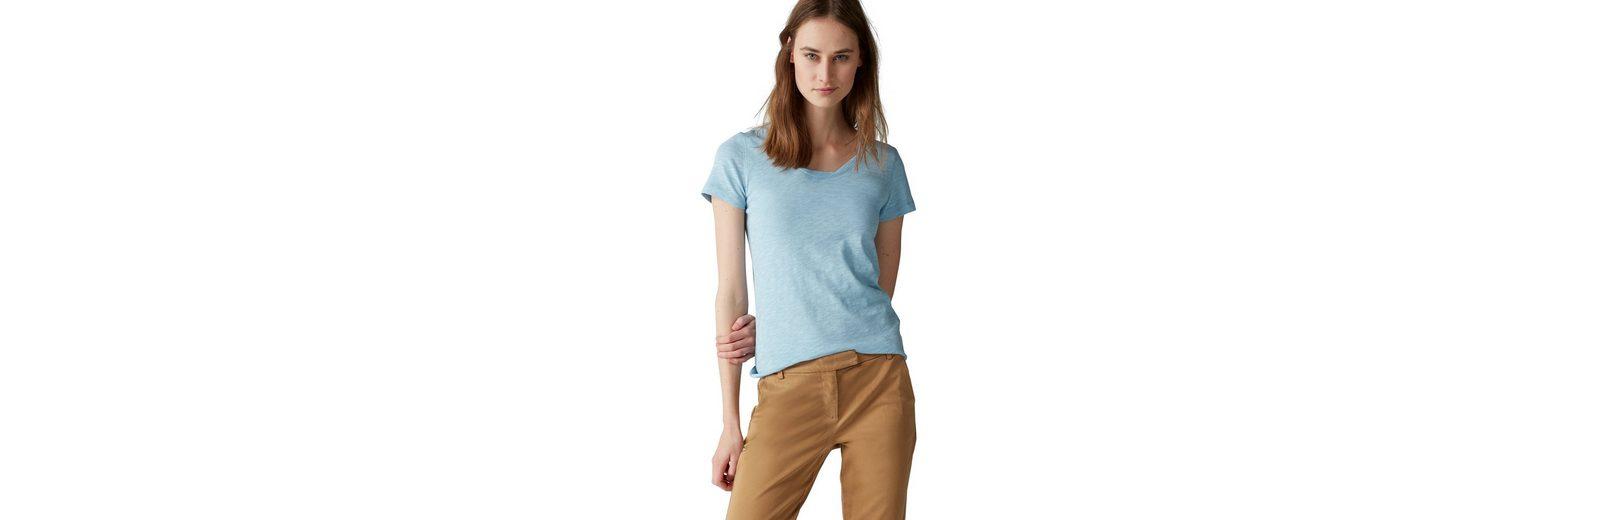 Shirt Marc T Marc O'Polo O'Polo O'Polo T Marc Shirt f7qAqwd